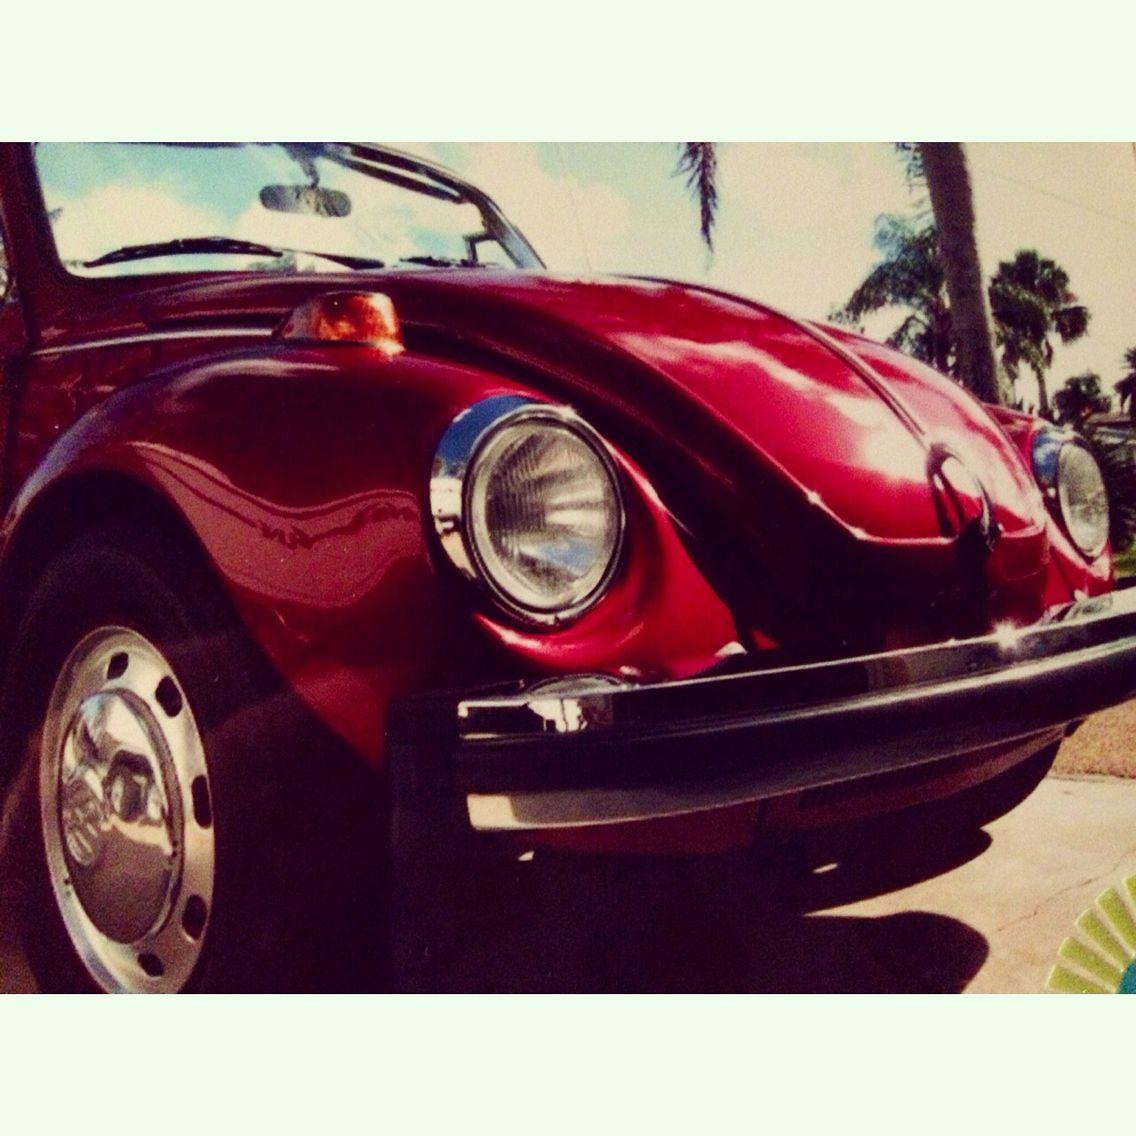 Sally, 1974 VW Super Beetle Convertible... KGray